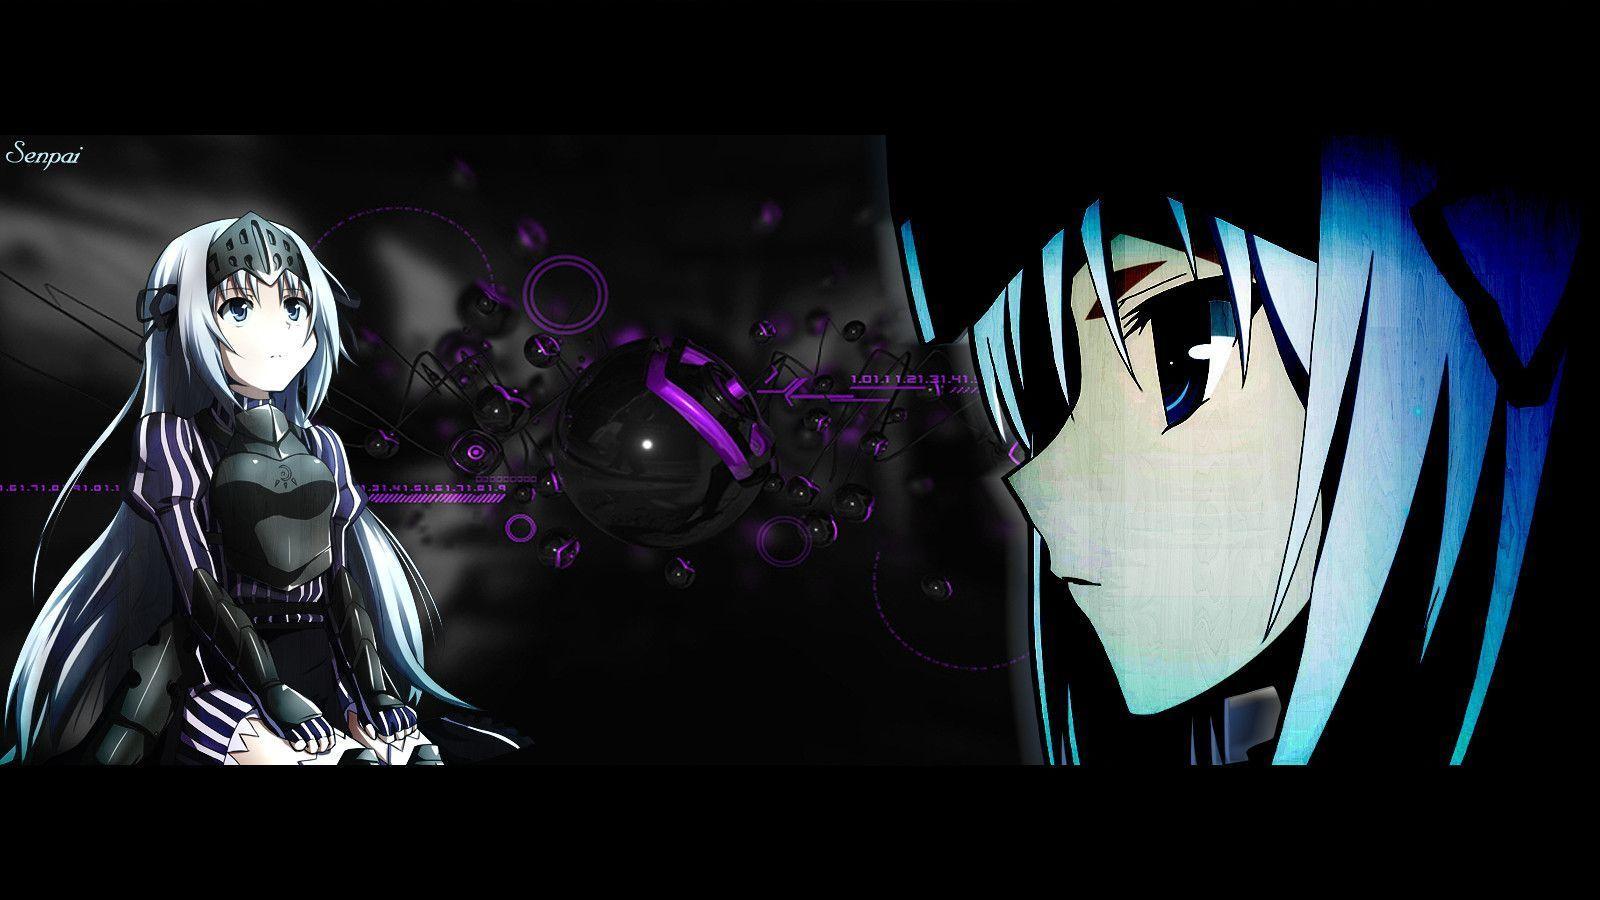 Kore wa Zombie Desu ka HD Wallpapers and Backgrounds